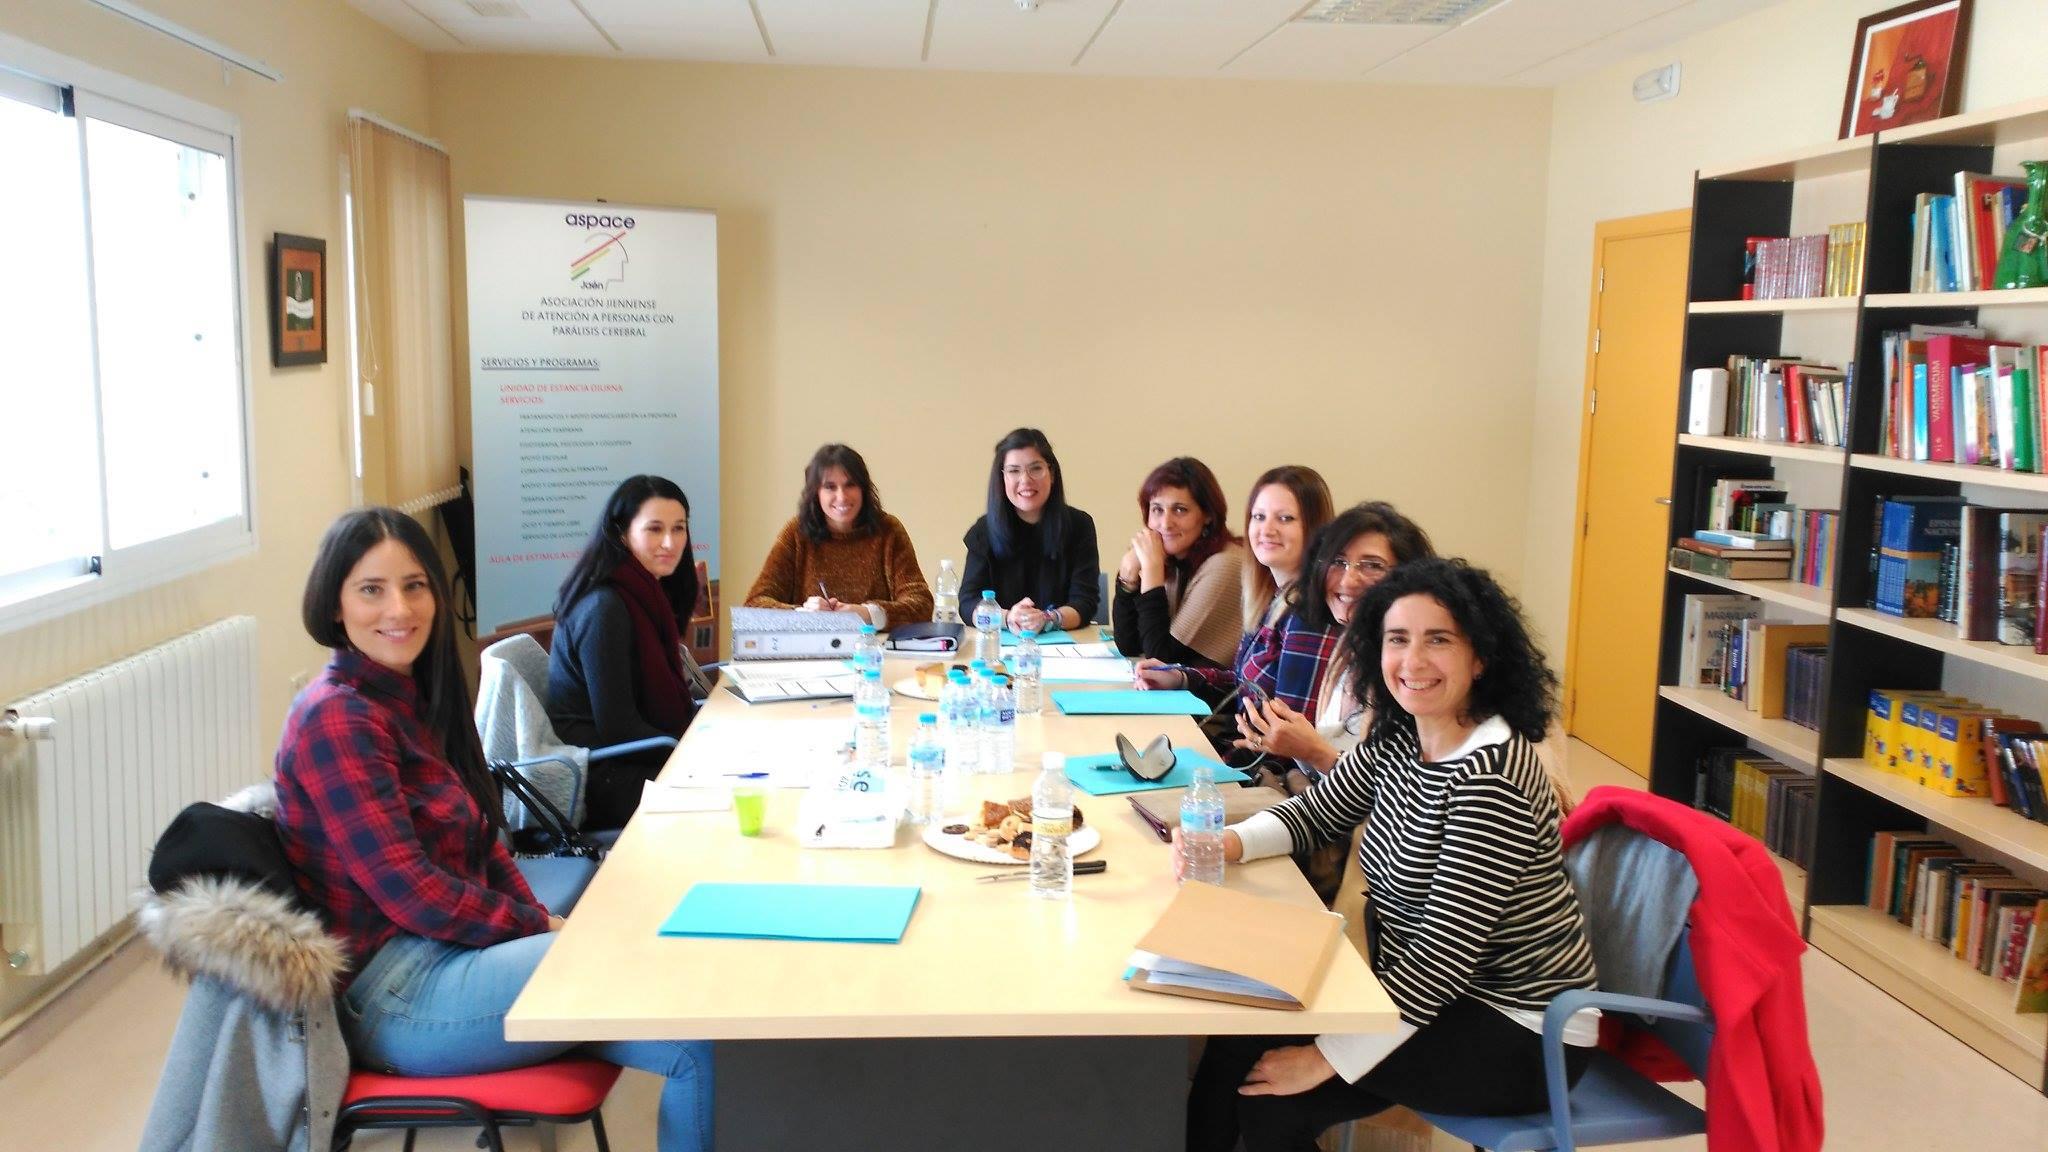 Aspace andaluc a conoce la nueva sala de integraci n - La sala nueva andalucia ...